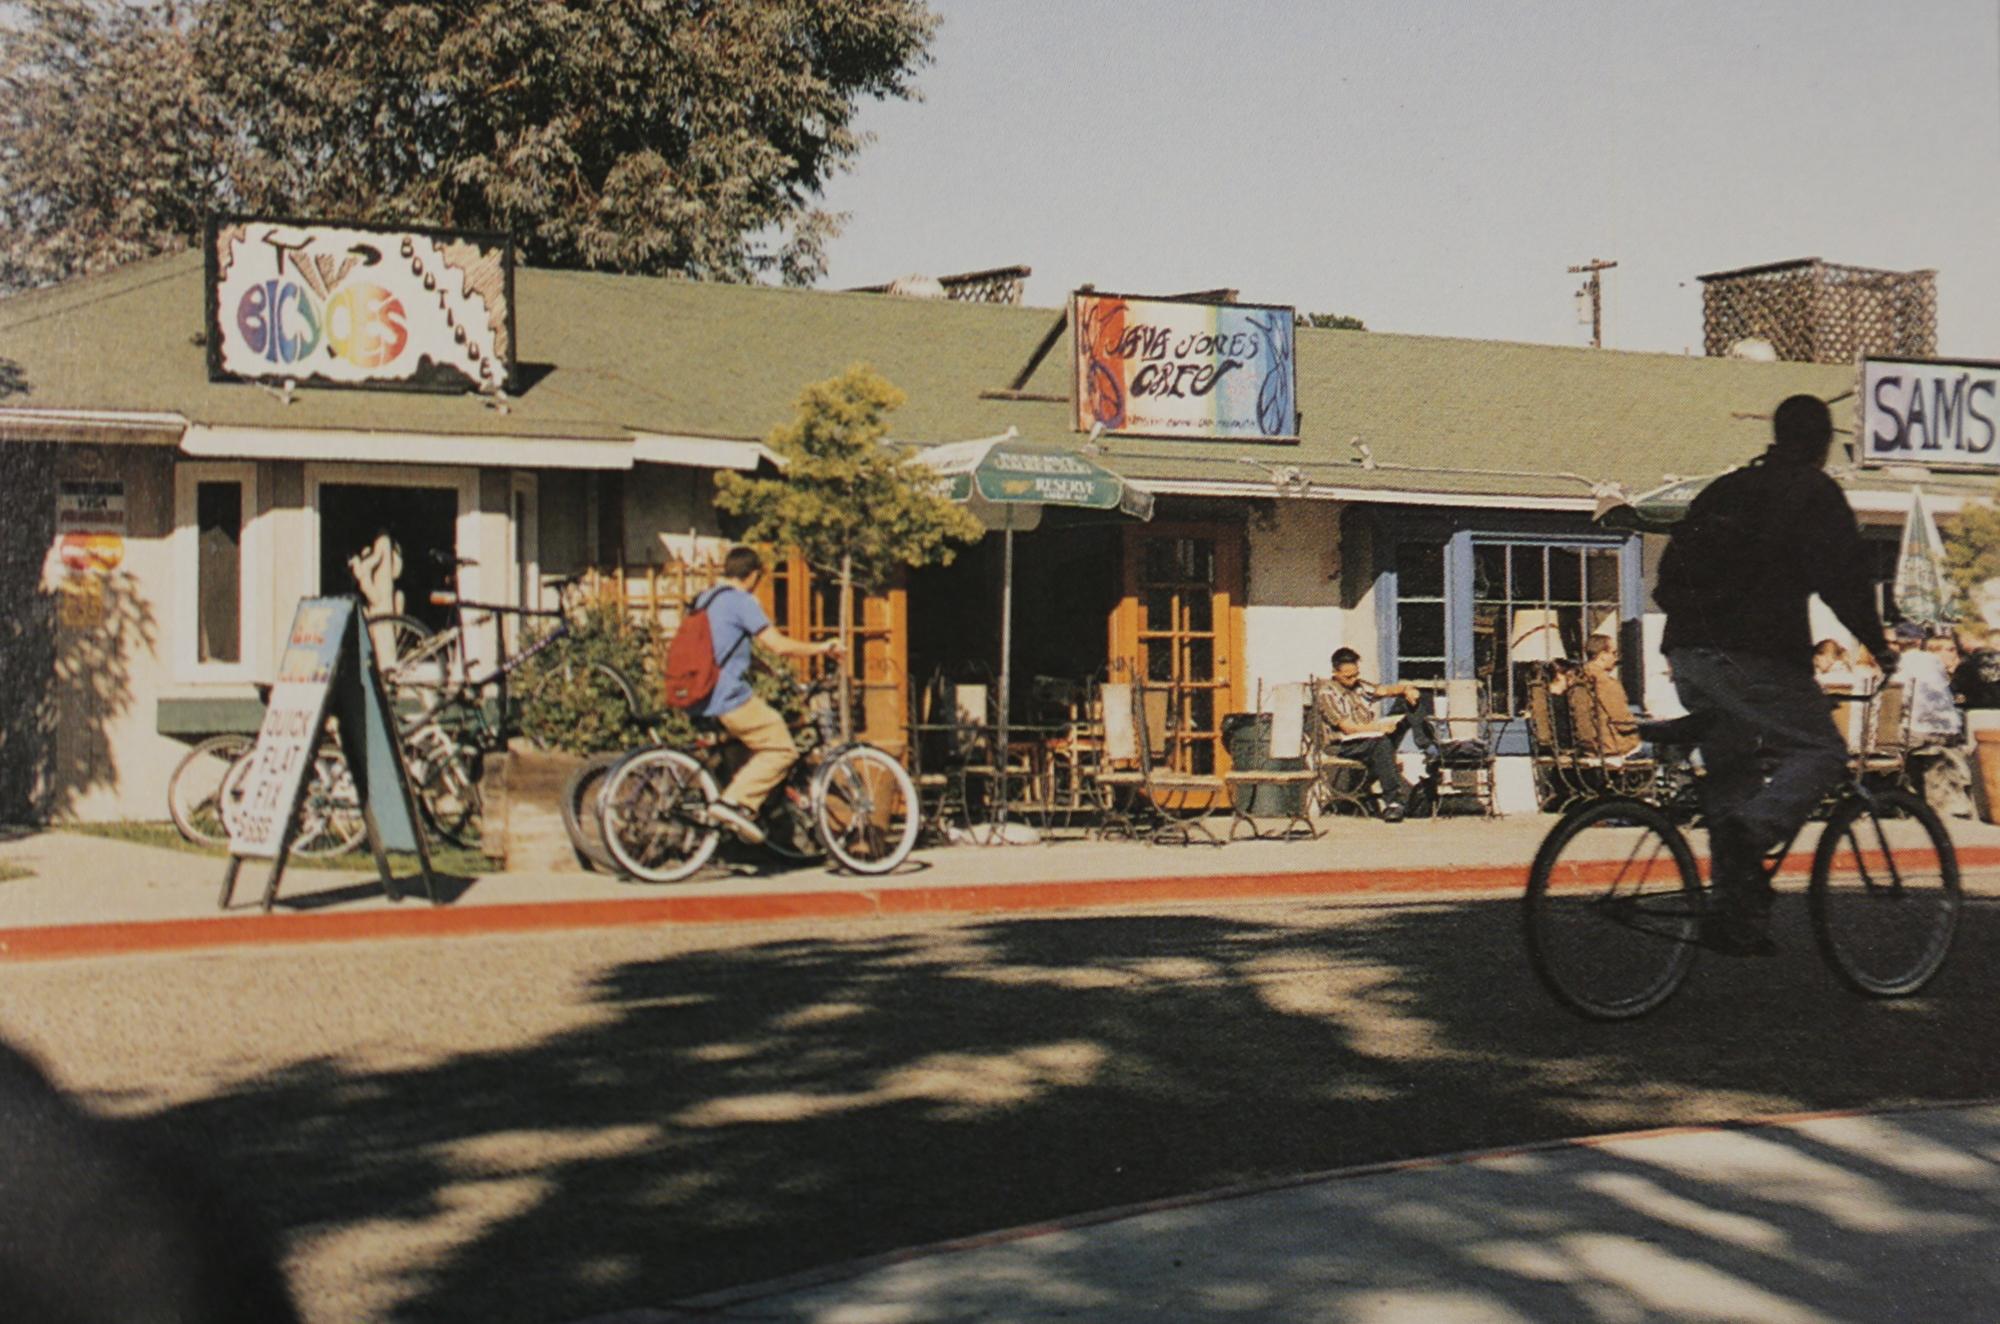 The Varsity Bike Shop in 1998. via La Cumbre archives